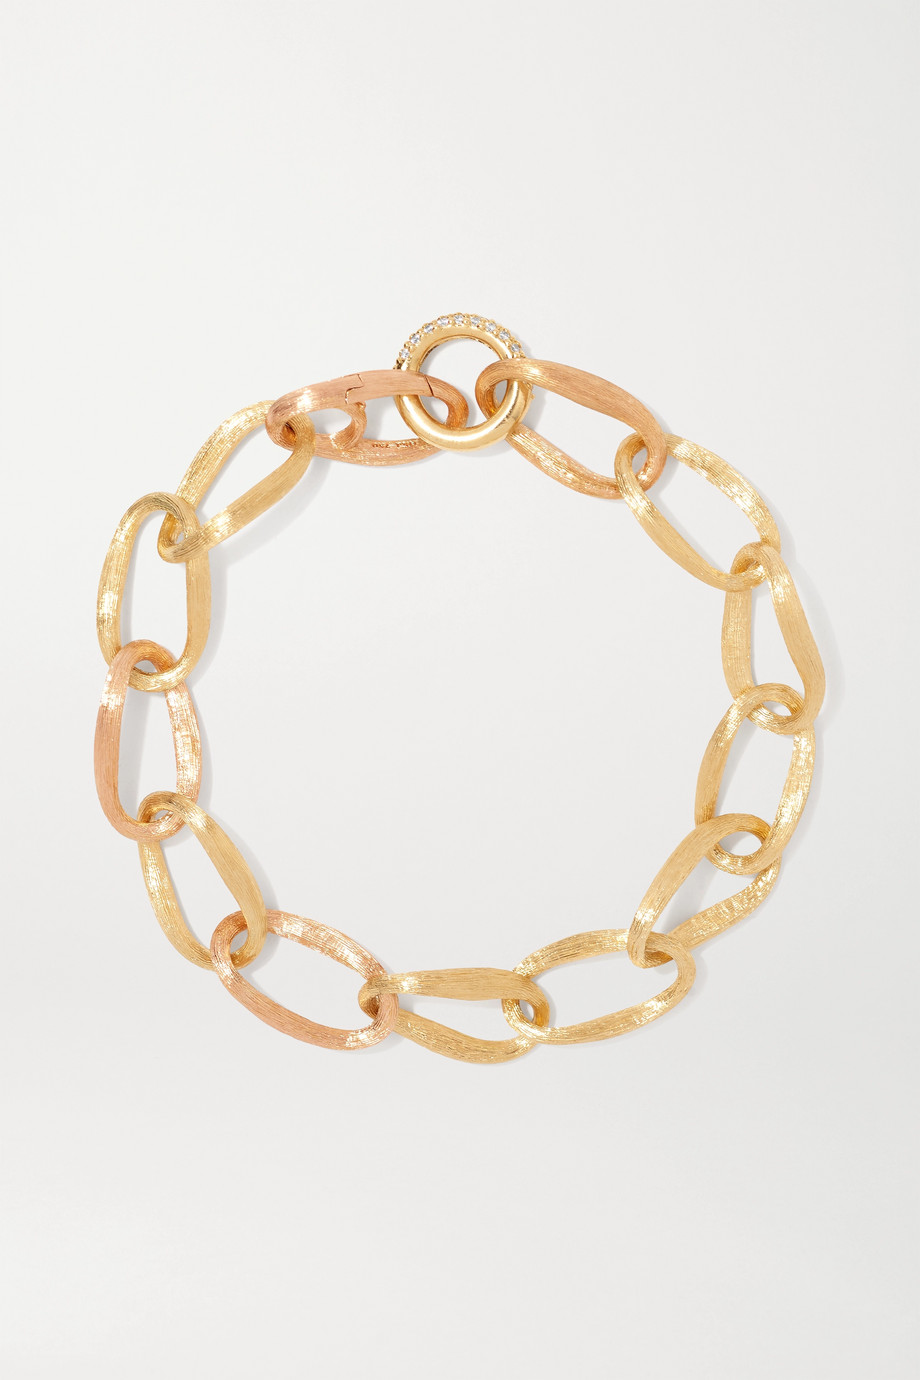 OLE LYNGGAARD COPENHAGEN Love medium 18-karat yellow and rose gold diamond bracelet